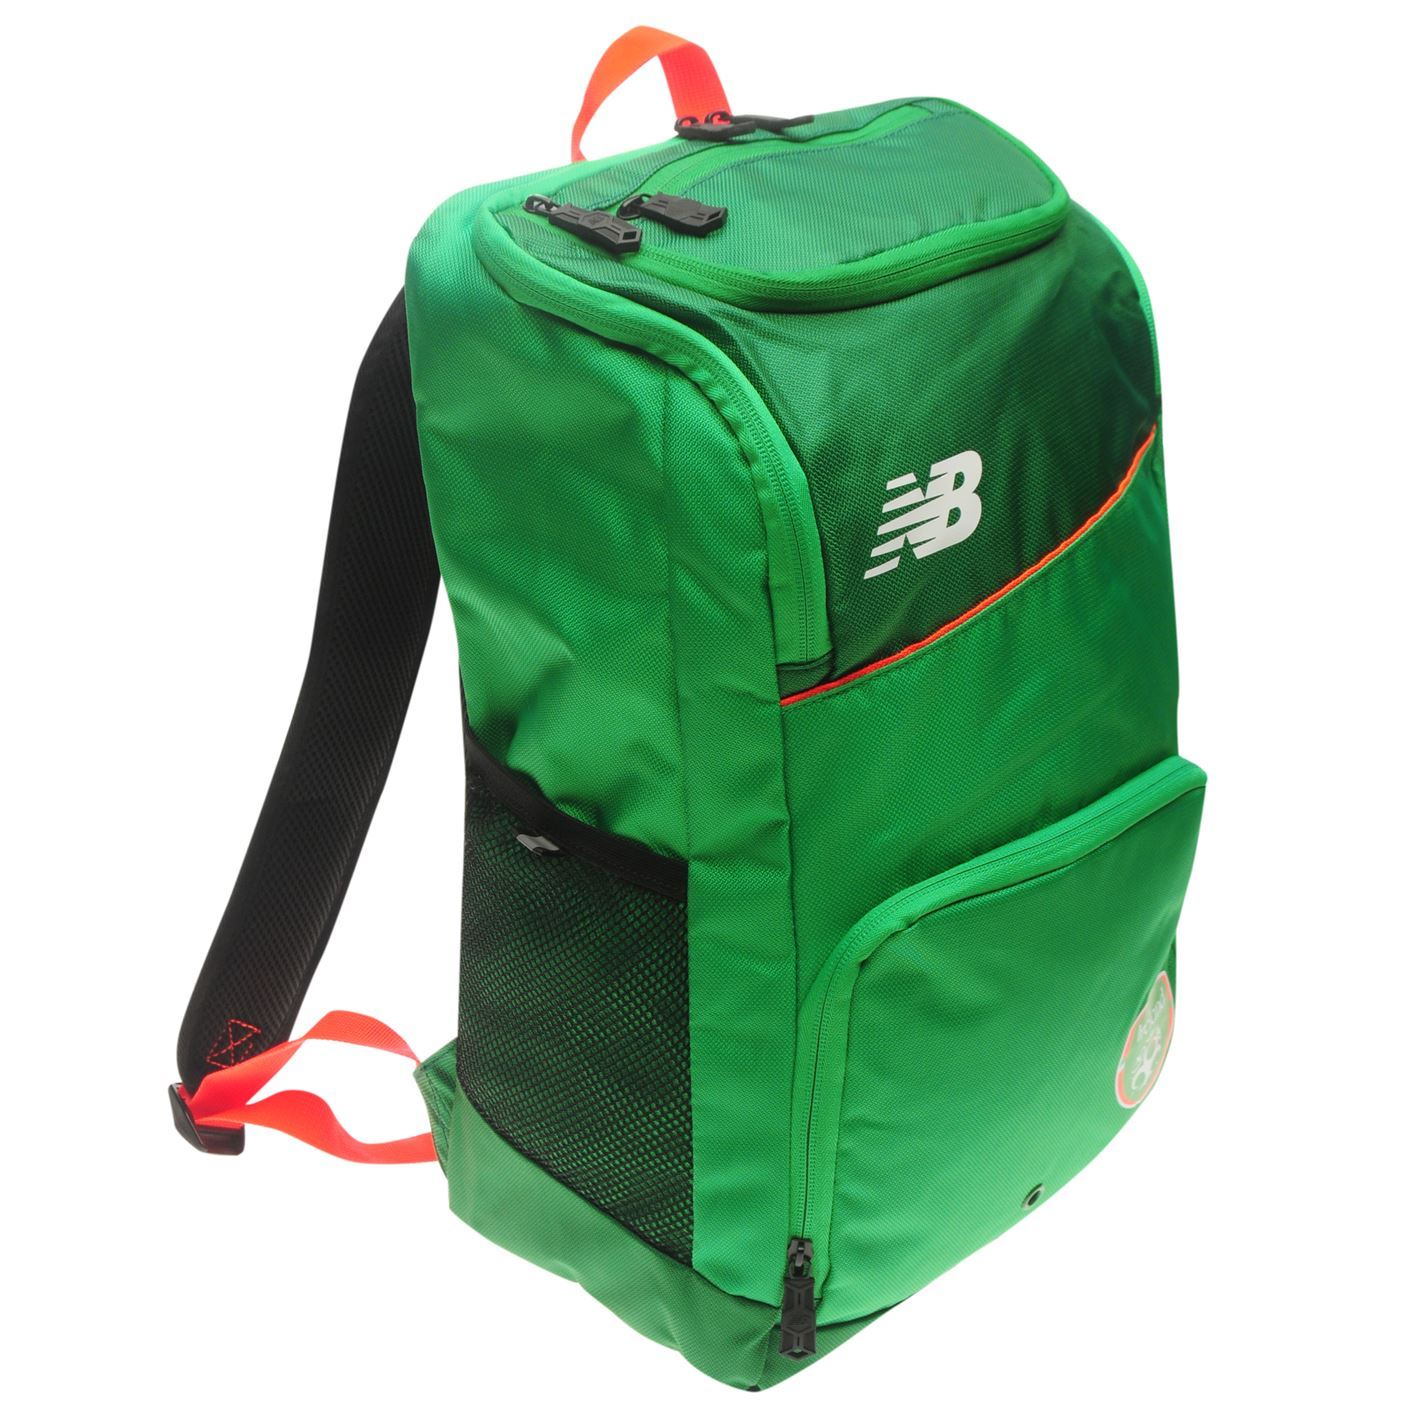 ... New Balance Ireland Football Bags Holdall Backpack Bootbag Rucksack  Backpack ... 20865ac2c8d09